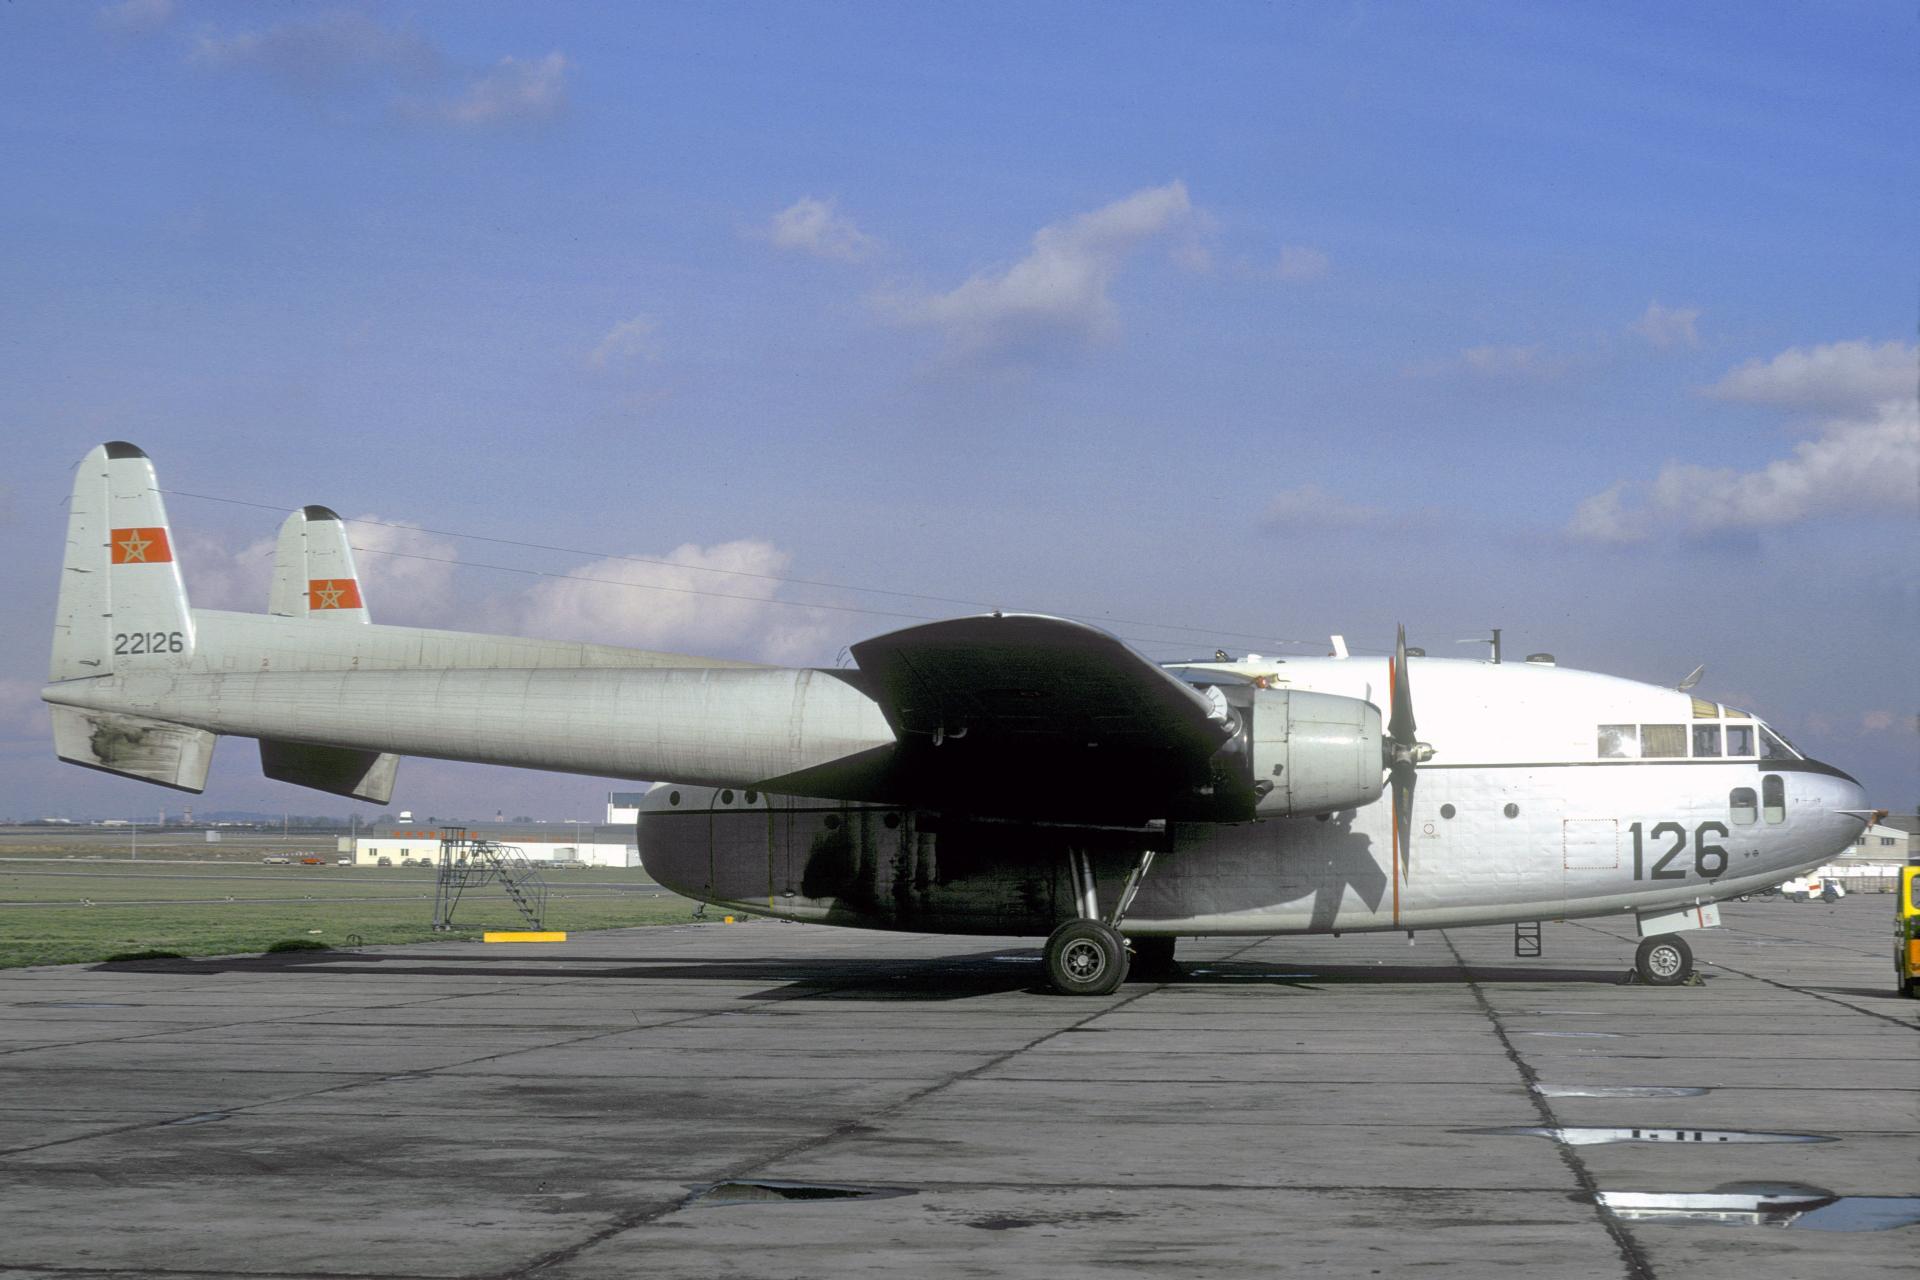 FRA: Photos anciens avions des FRA - Page 7 151220063125220576